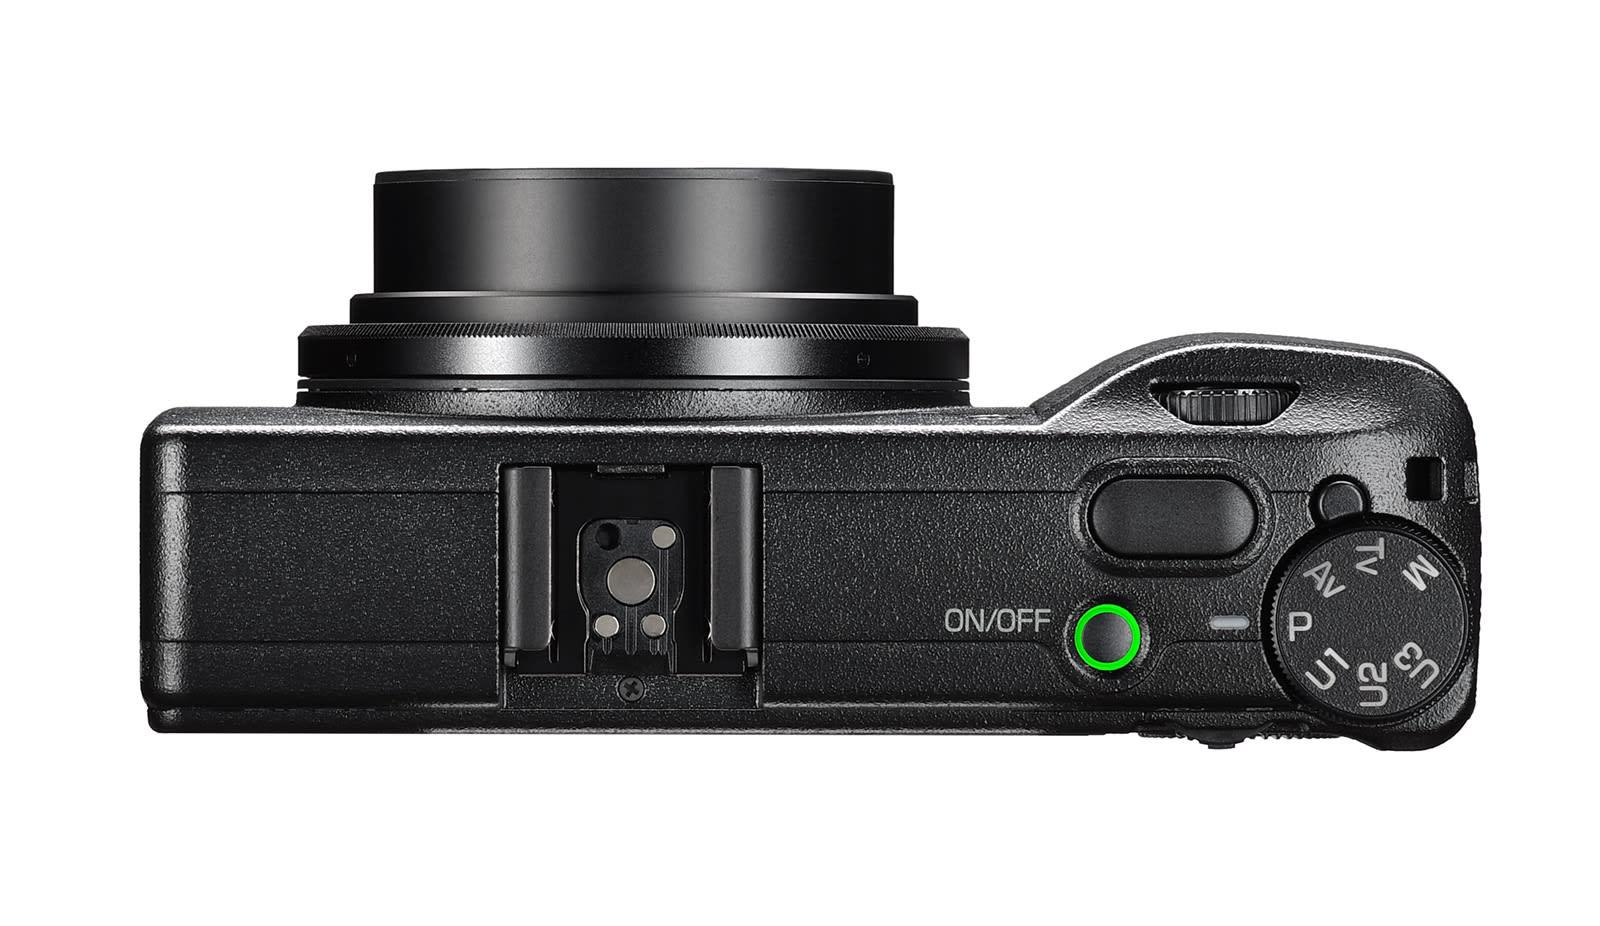 Ricoh GR III APS-C compact camera